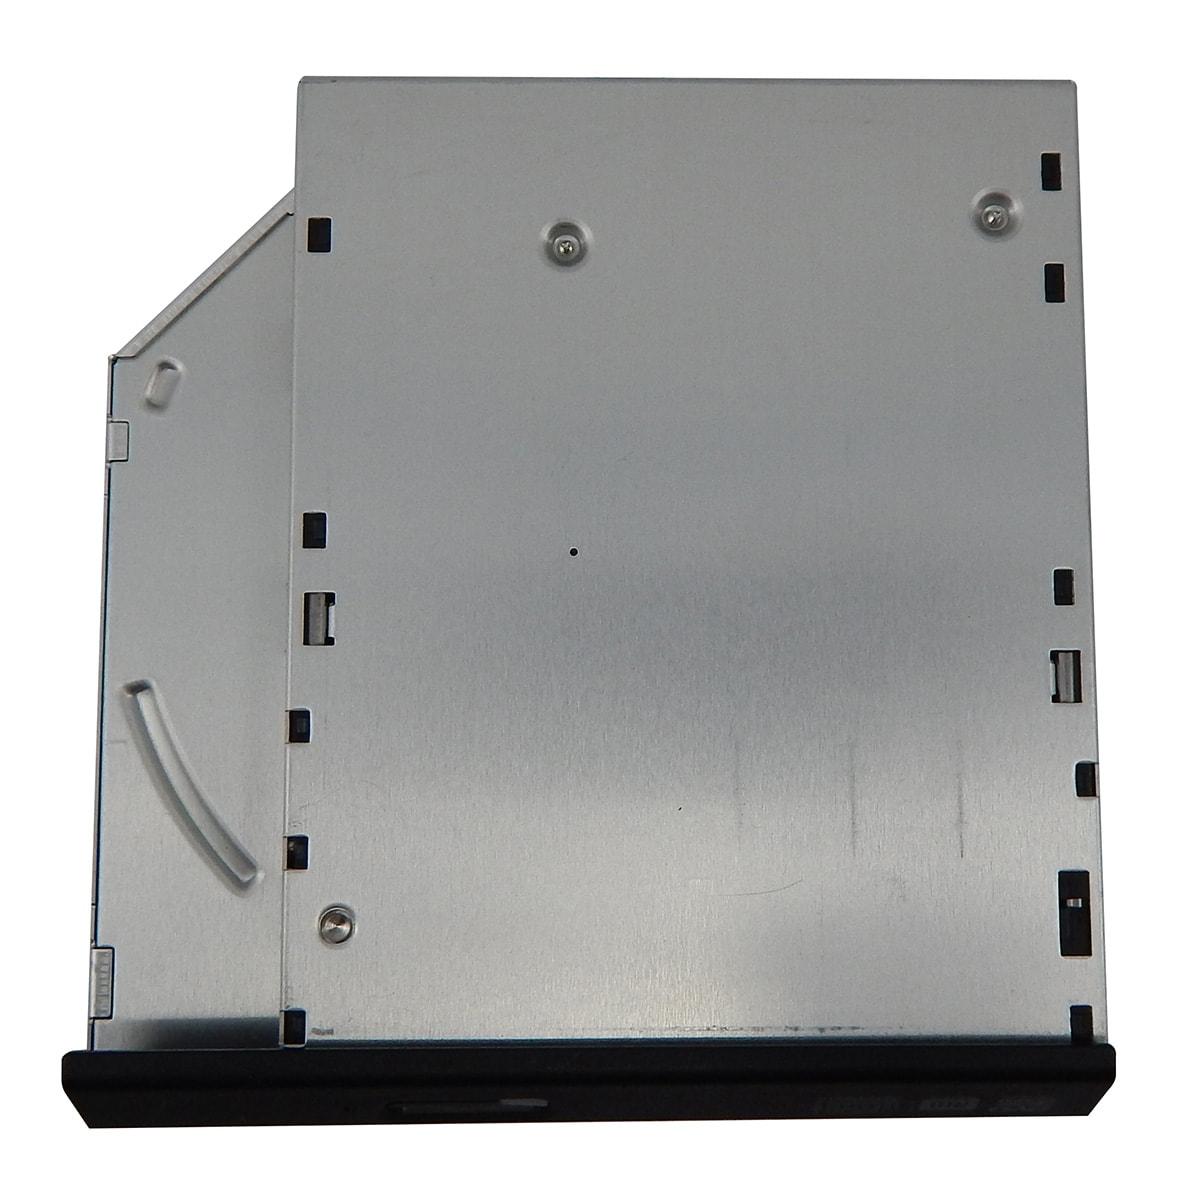 Driver CD/DVD Panasonic p/ Notebook Model UJ8B1 - P/N: 25-013478 F/W: 8.20 H/W:1.00